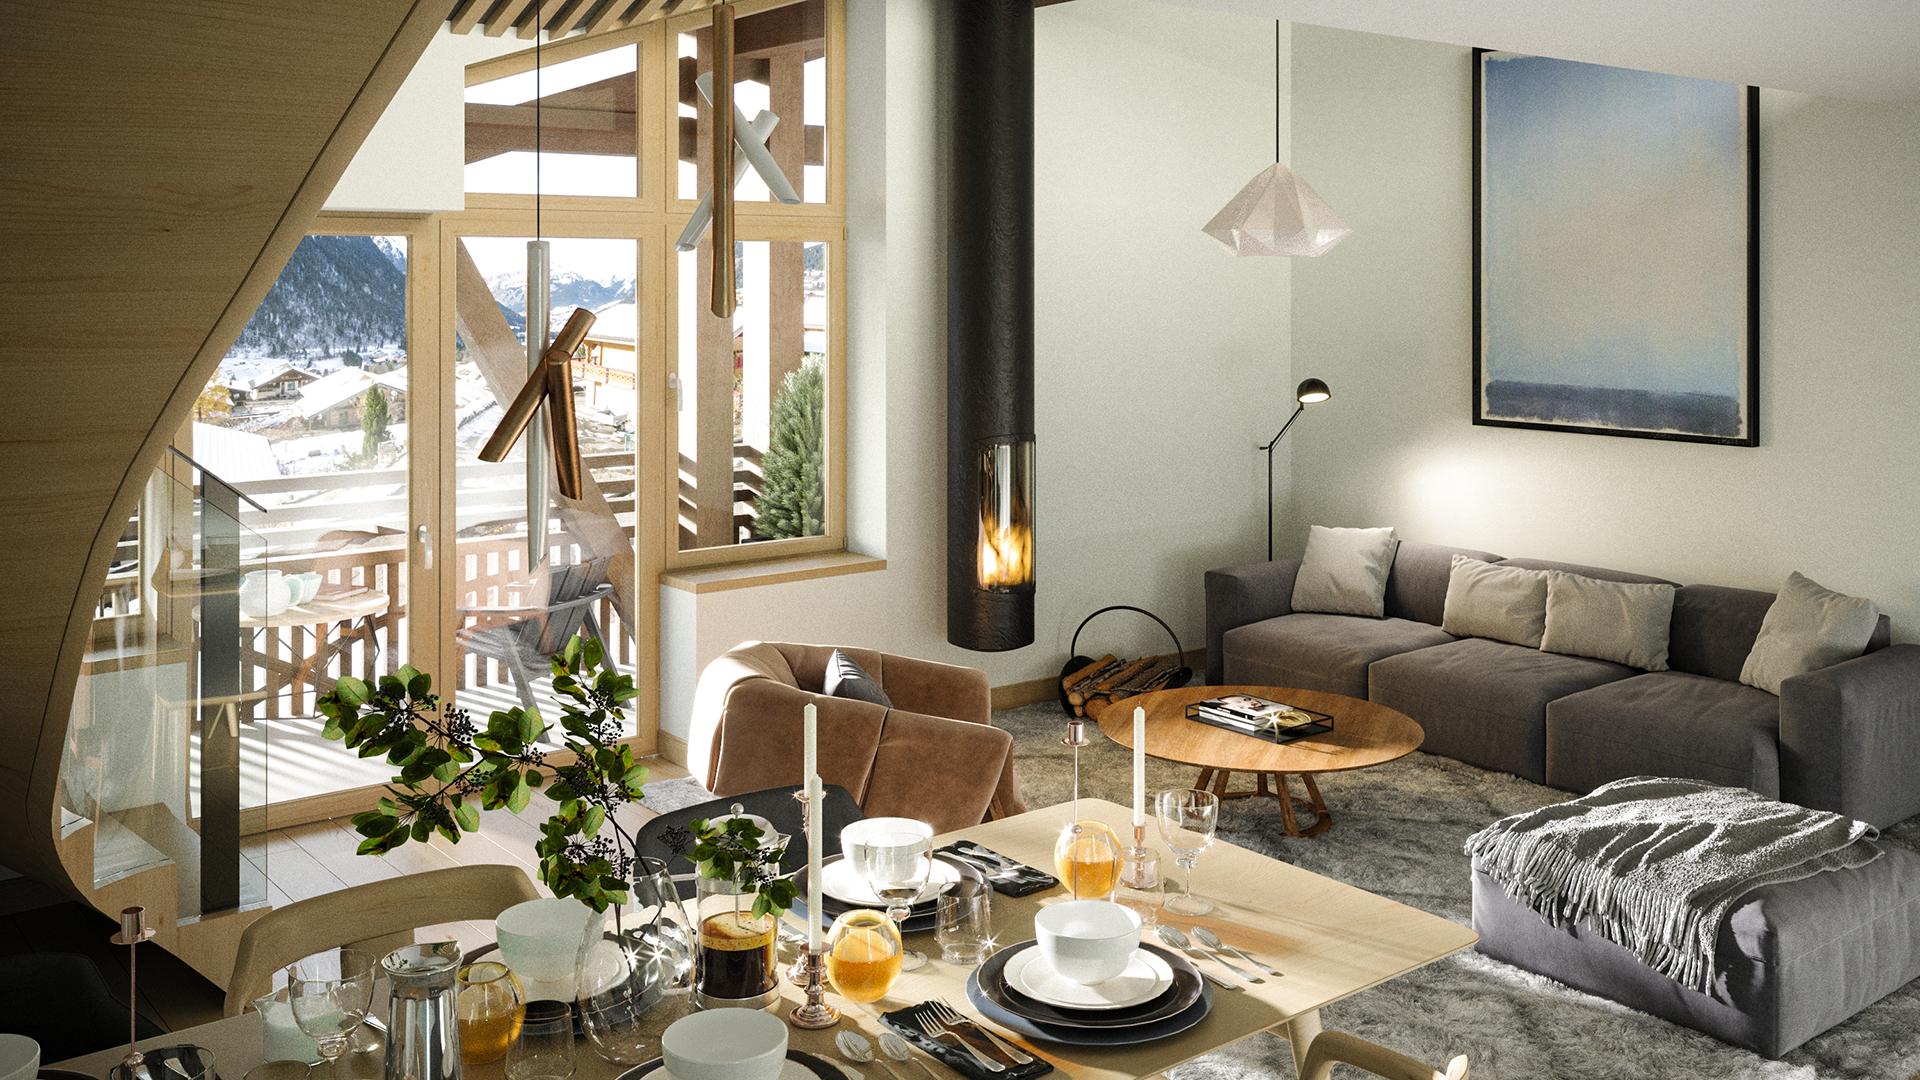 Residence Imelda & Gaby Apartments, France